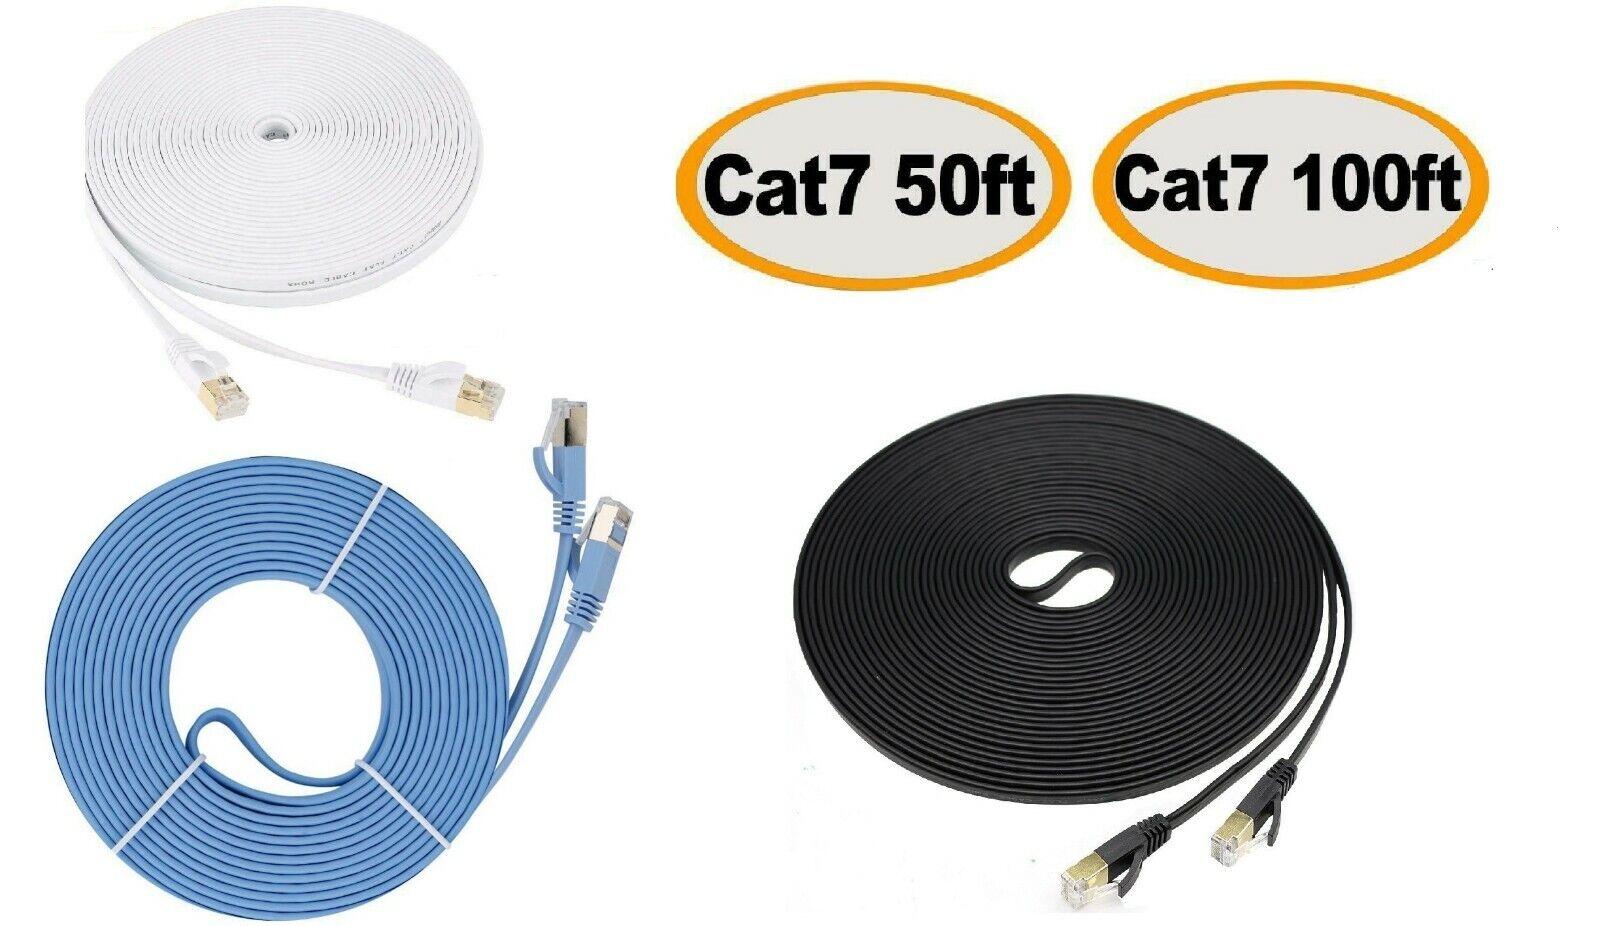 Cat7 RJ45 Ethernet Flat Patch Network LAN Shielded Internet Cable 50ft 100ft US Computer Cables & Connectors